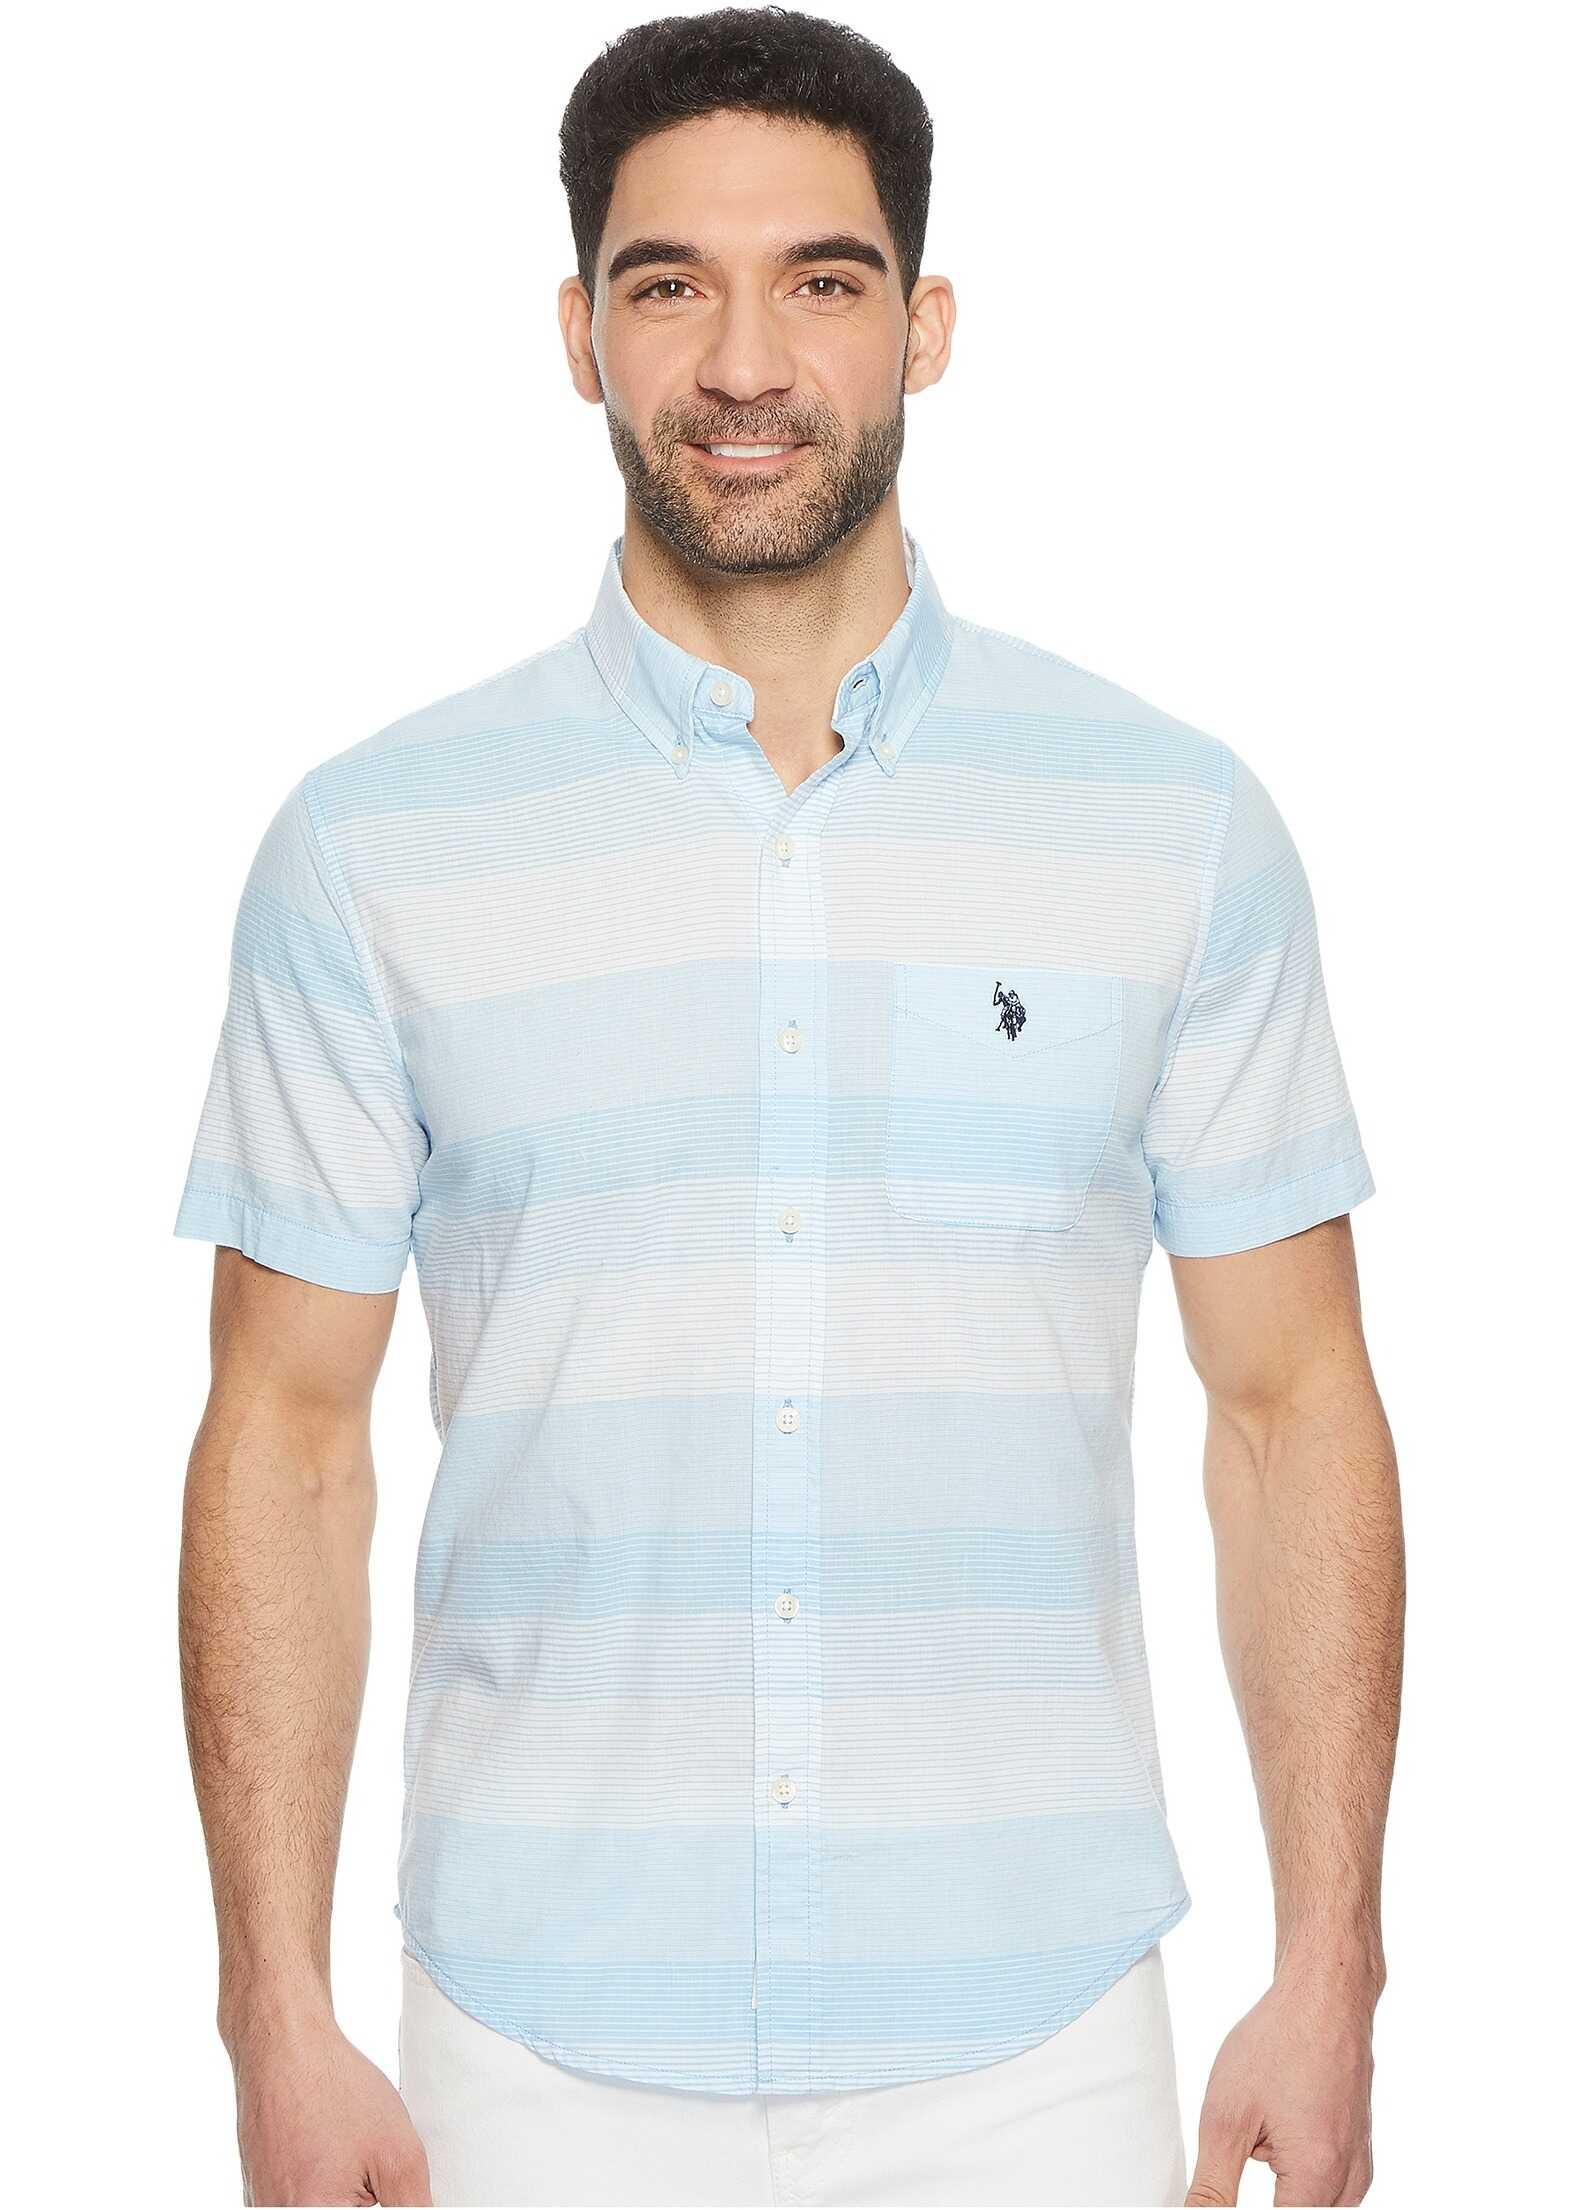 U.S. POLO ASSN. Short Sleeve Slim Fit Striped Shirt Coast Azure